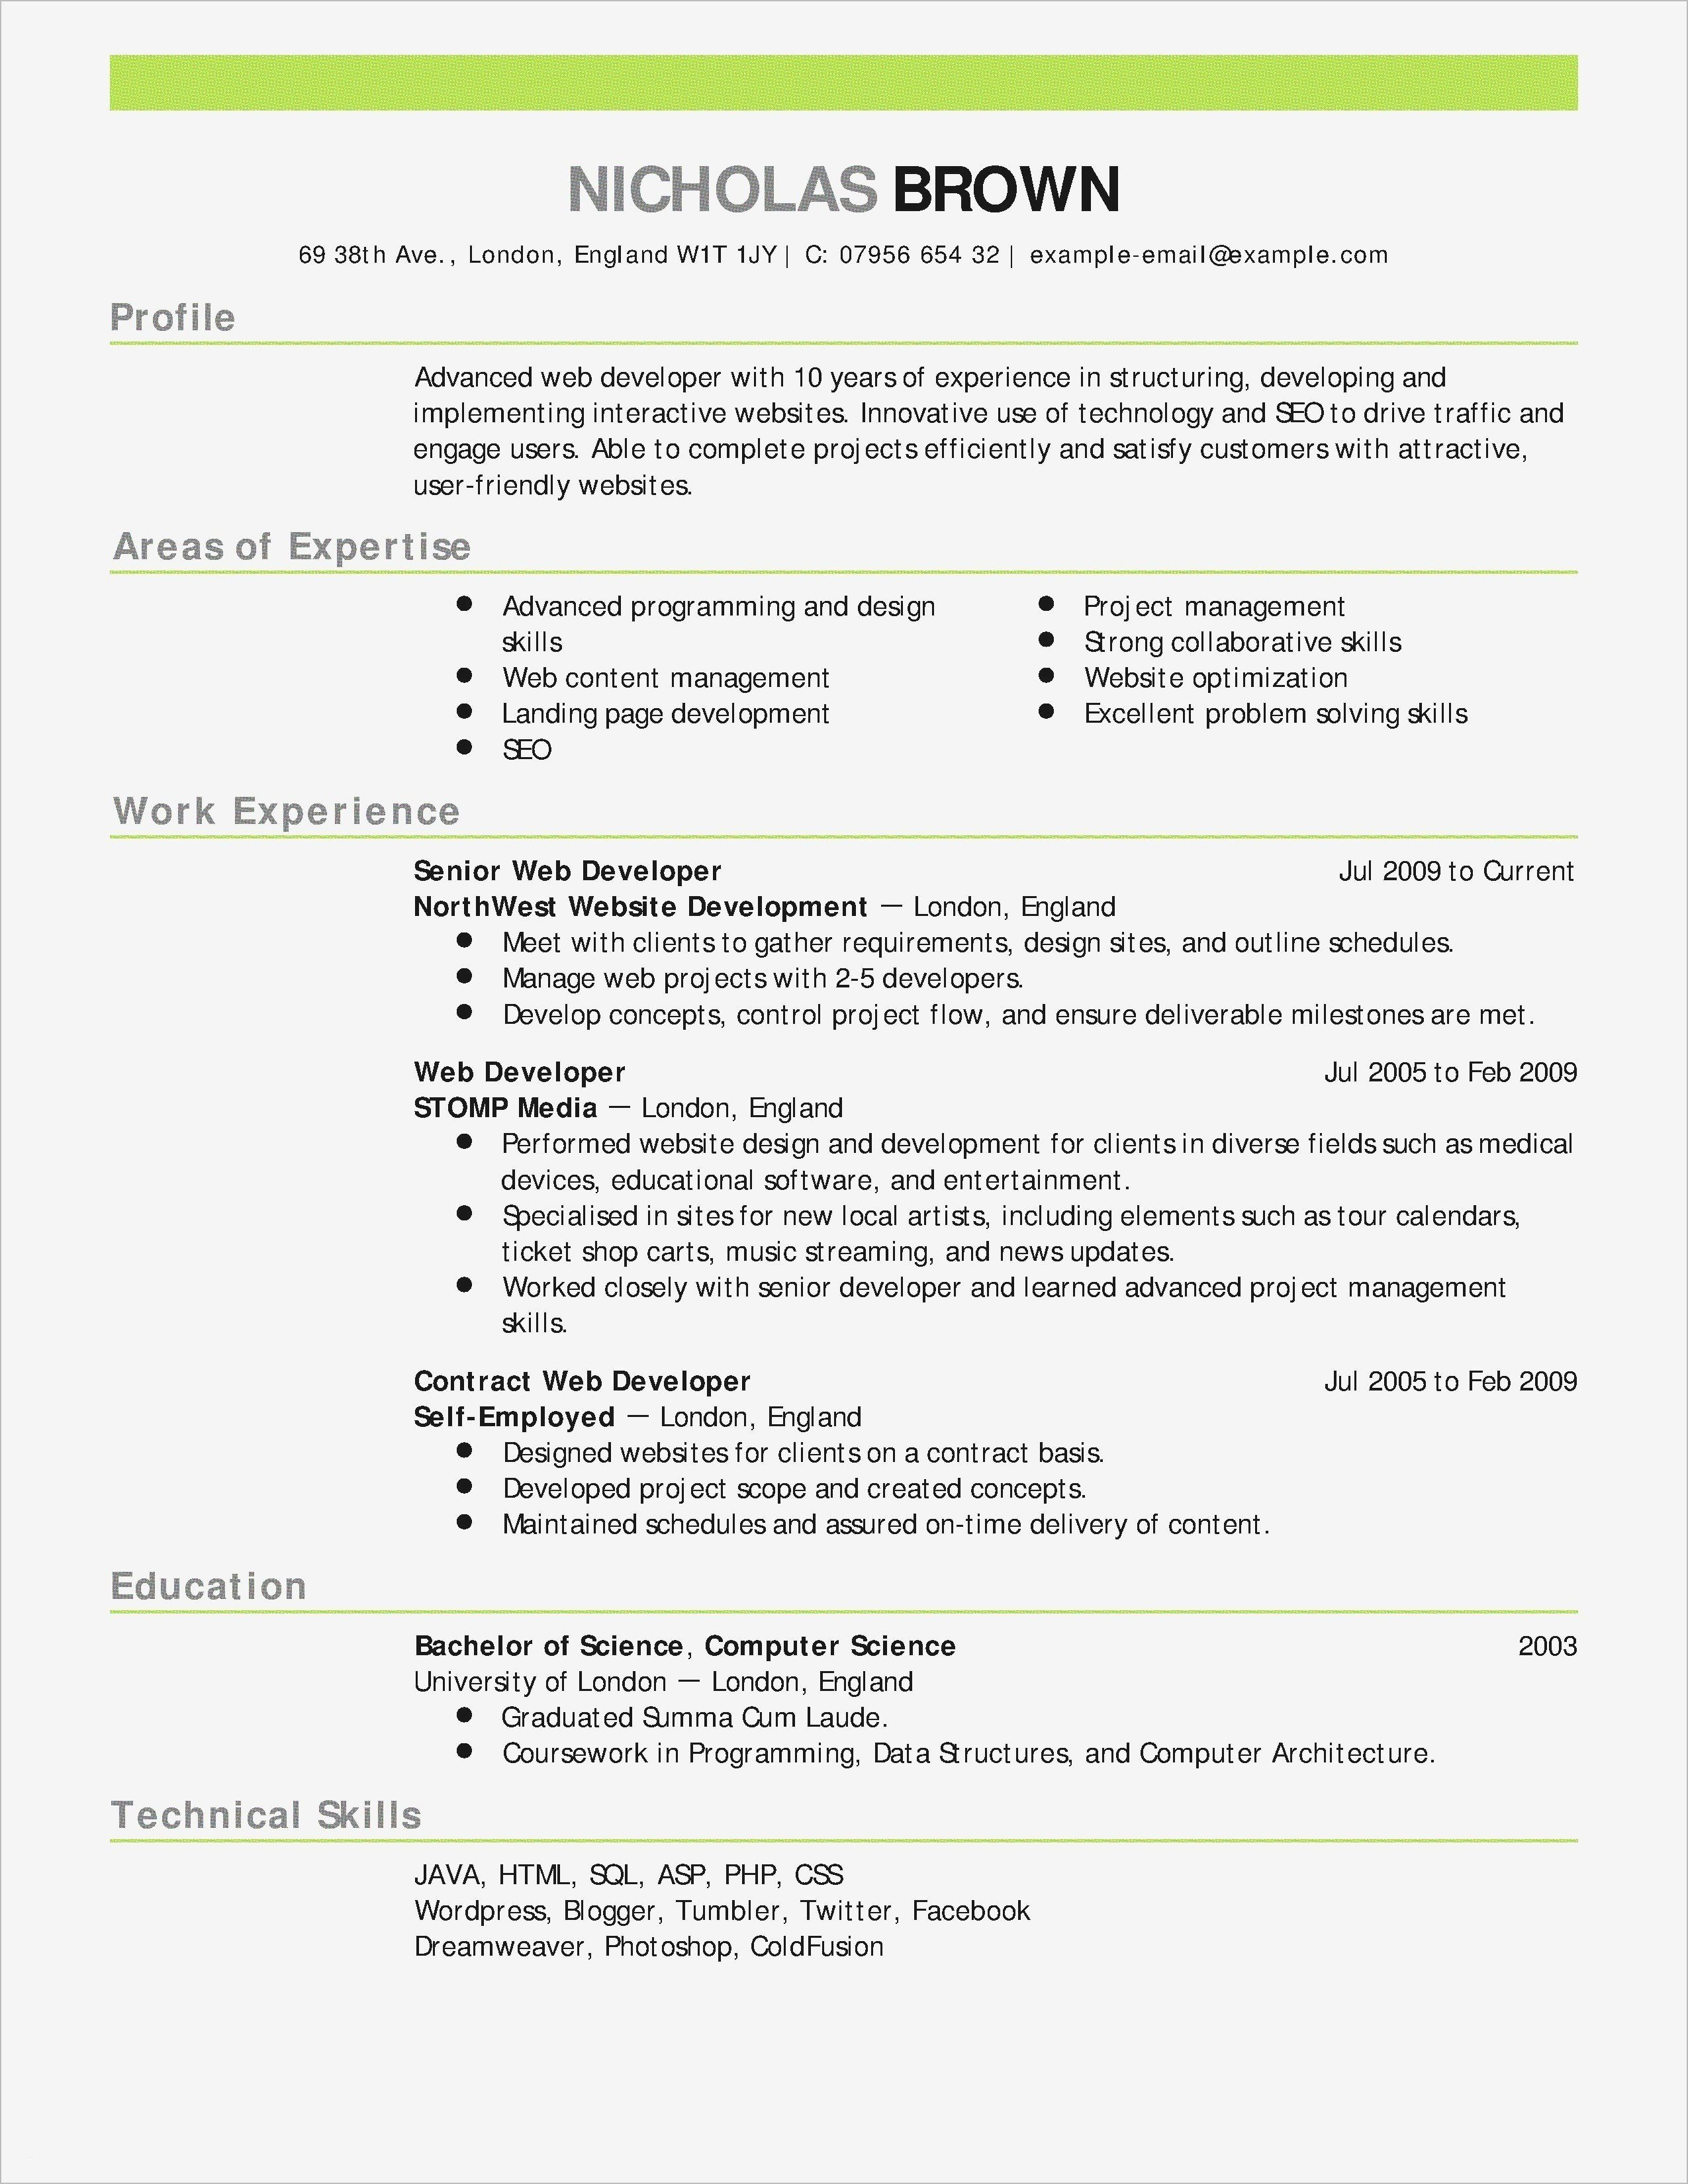 Elementary Teachers Resume Examples Best Of New Teacher Resume Sample Job Resume Examples Teaching Resume Resume Skills